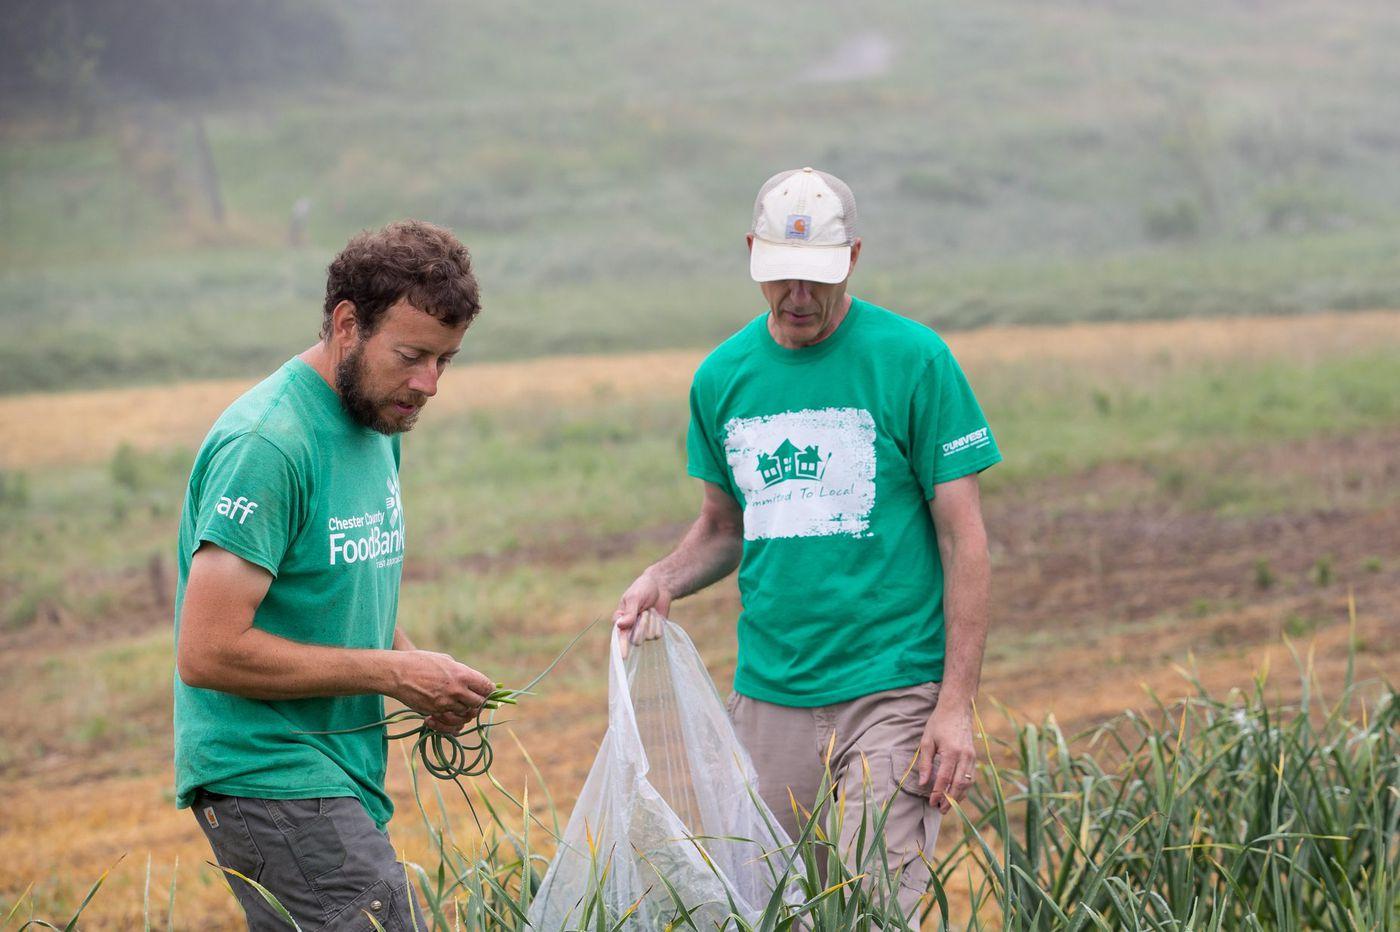 In Chesco, volunteer farmers grow food for neighbors in need